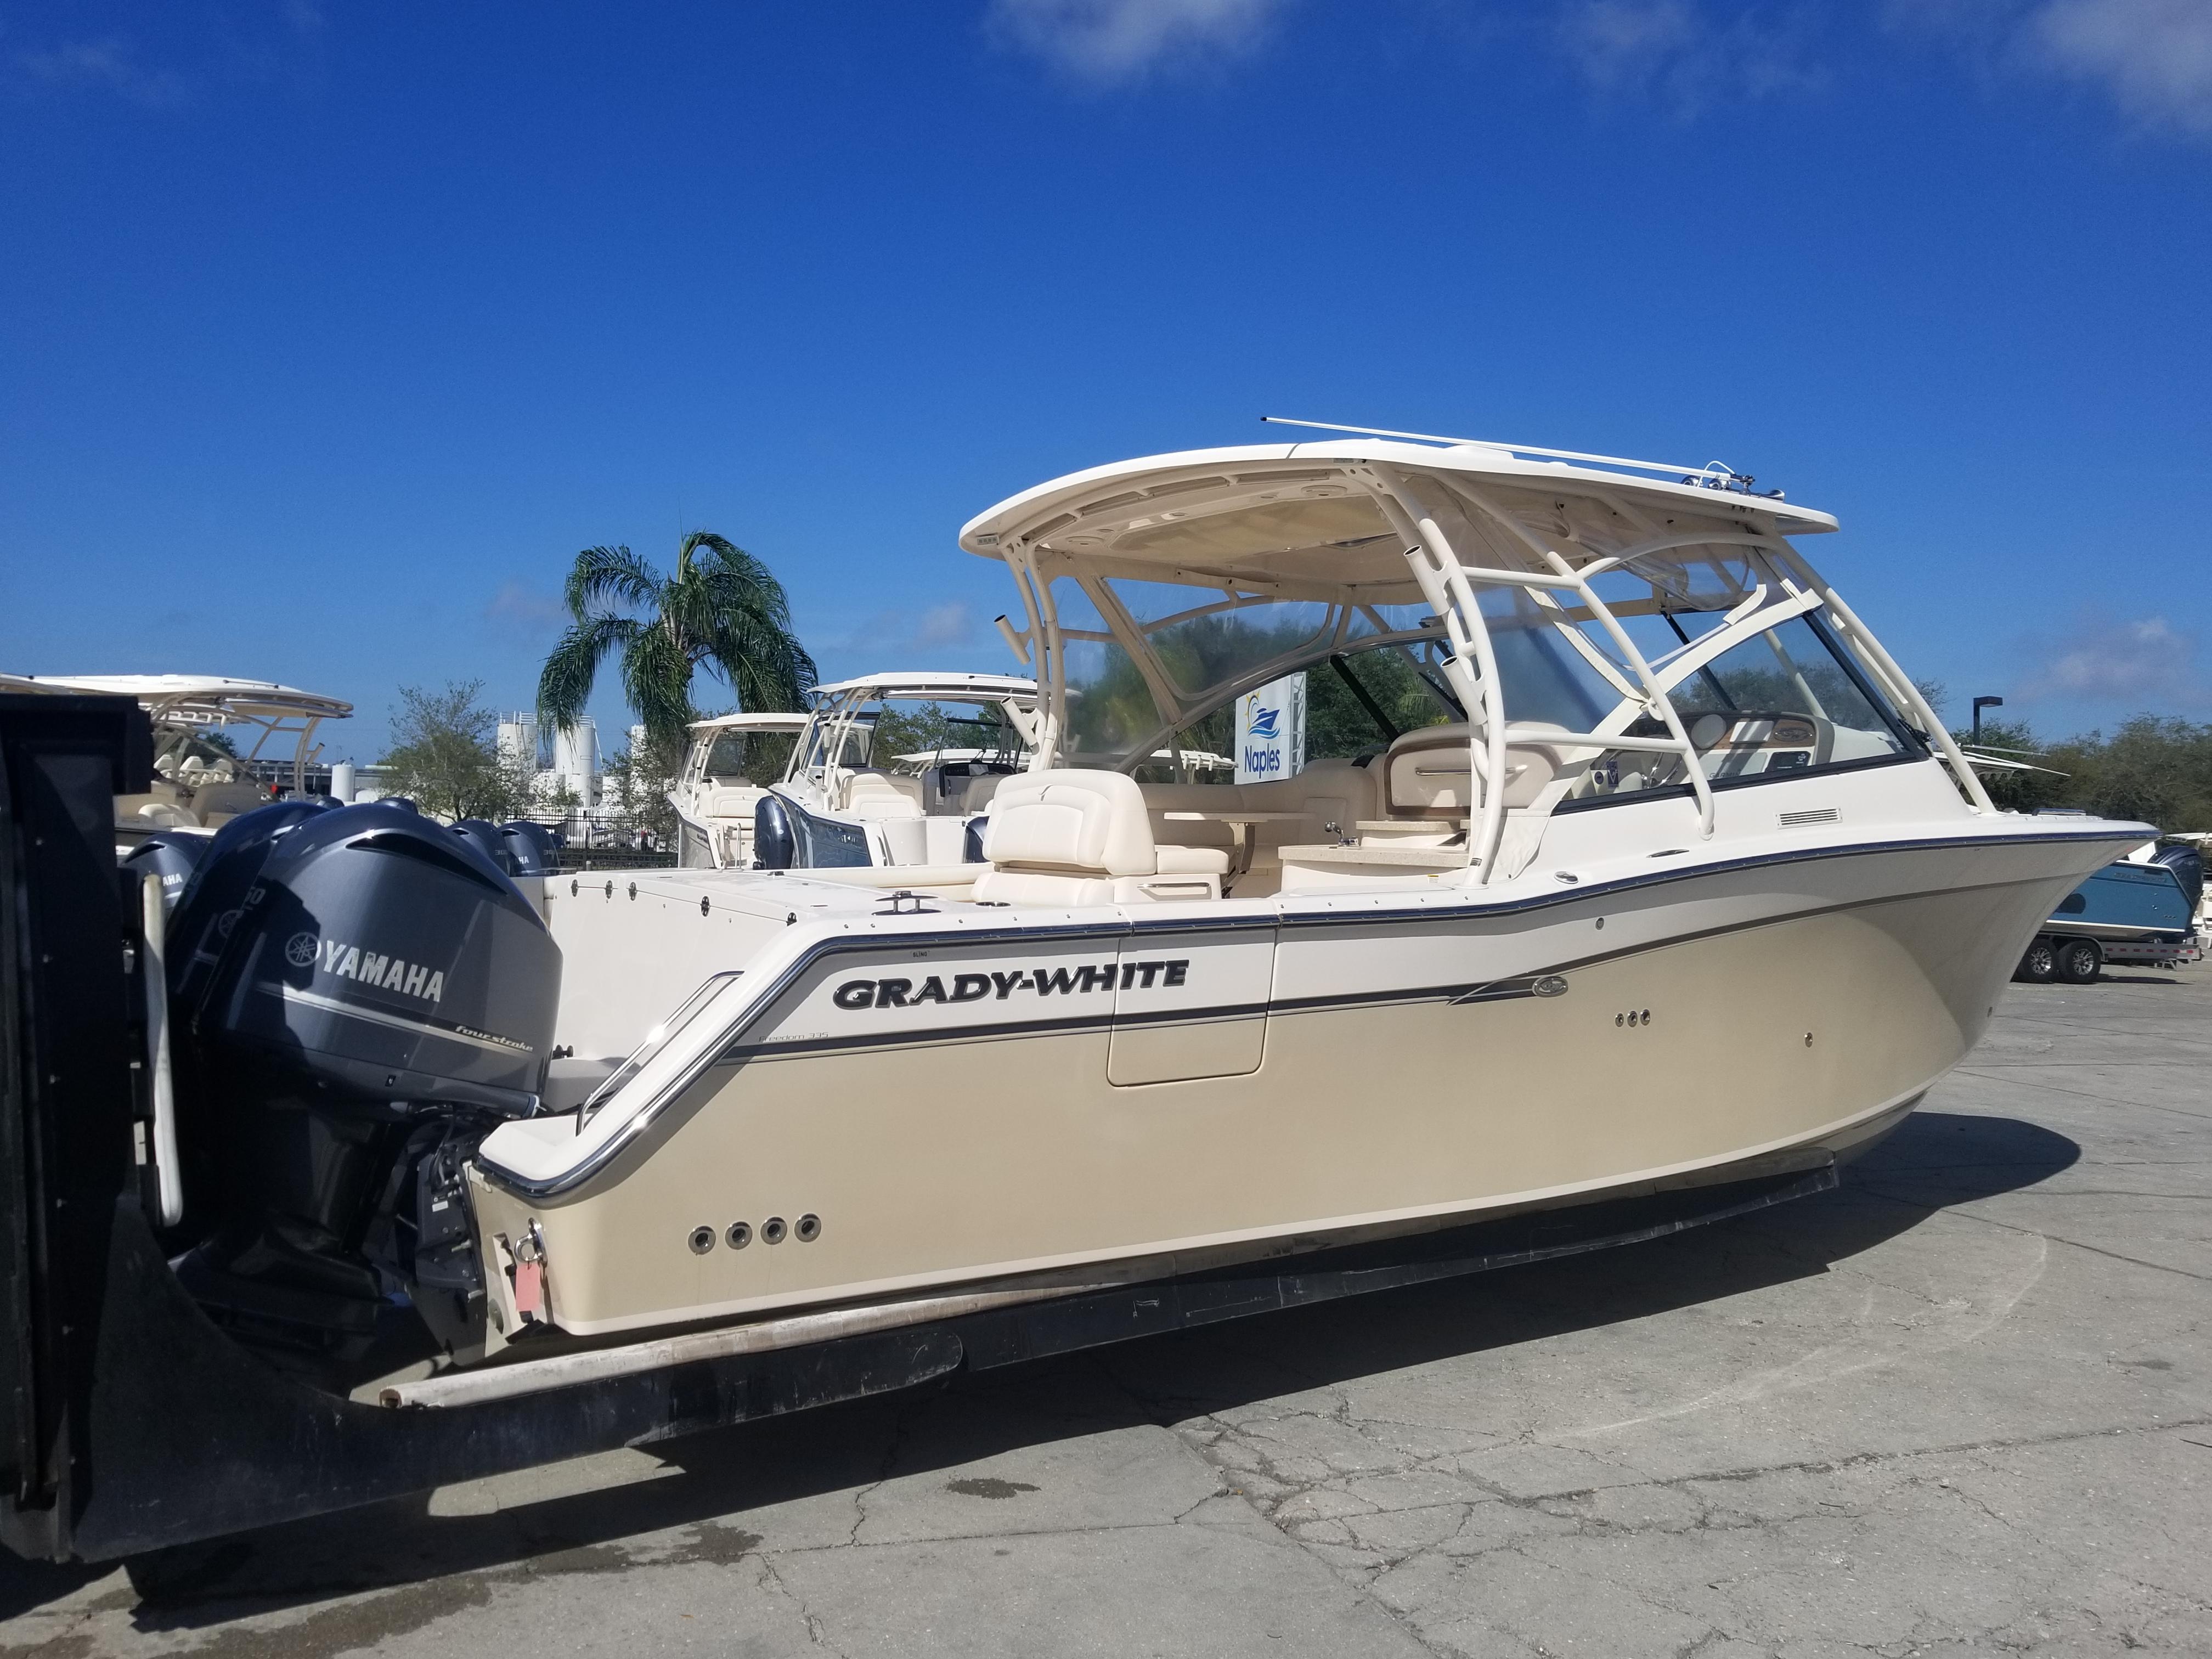 Grady-White Freedom 335 Starboard side hull profile - 335 Grady-White Freedom w/ dive door for side boarding